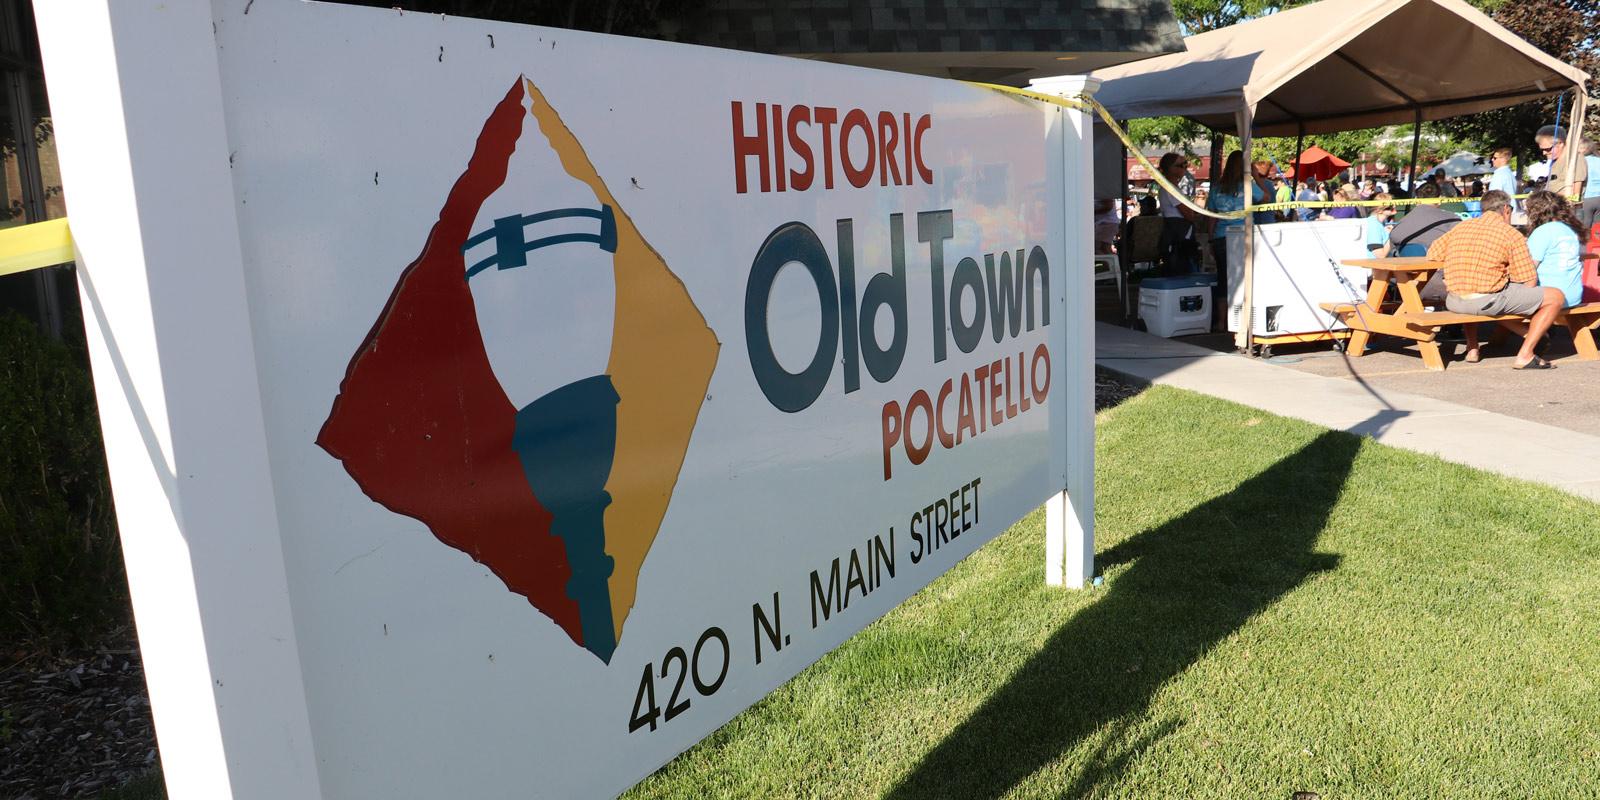 Pavilion at Old Town Pocatello